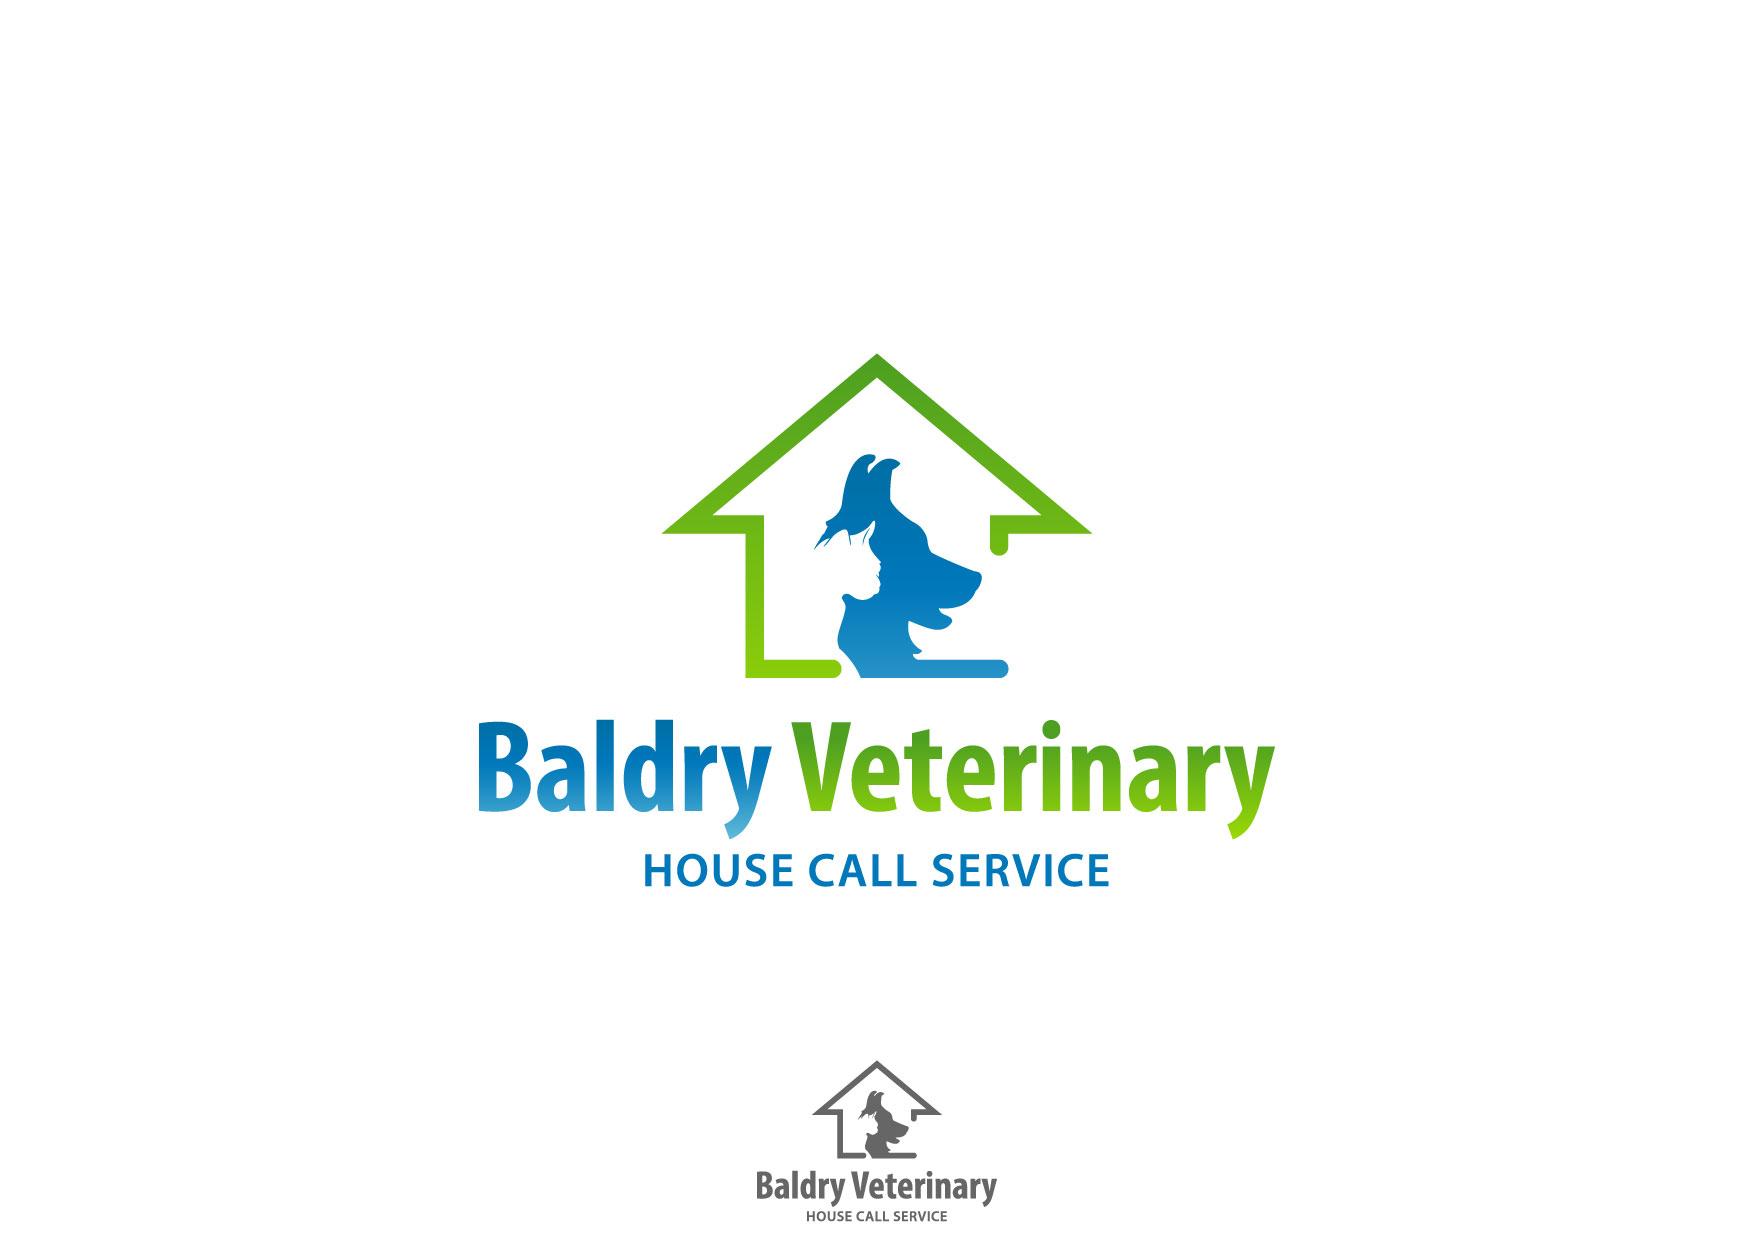 Logo Design by Nurgalih Destianto - Entry No. 74 in the Logo Design Contest Captivating Logo Design for Baldry Veterinary House Call Service.